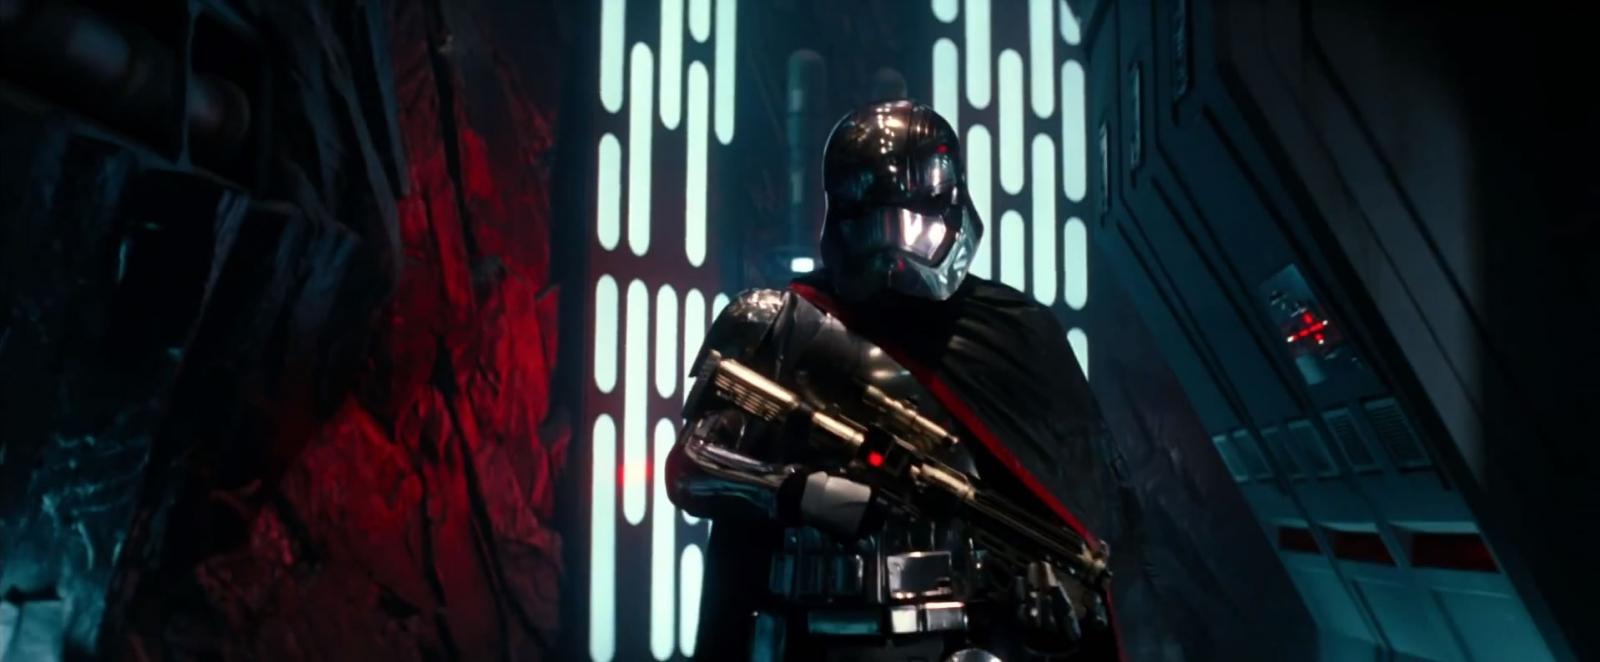 Star Wars The Force Awakens Chrome Trooper